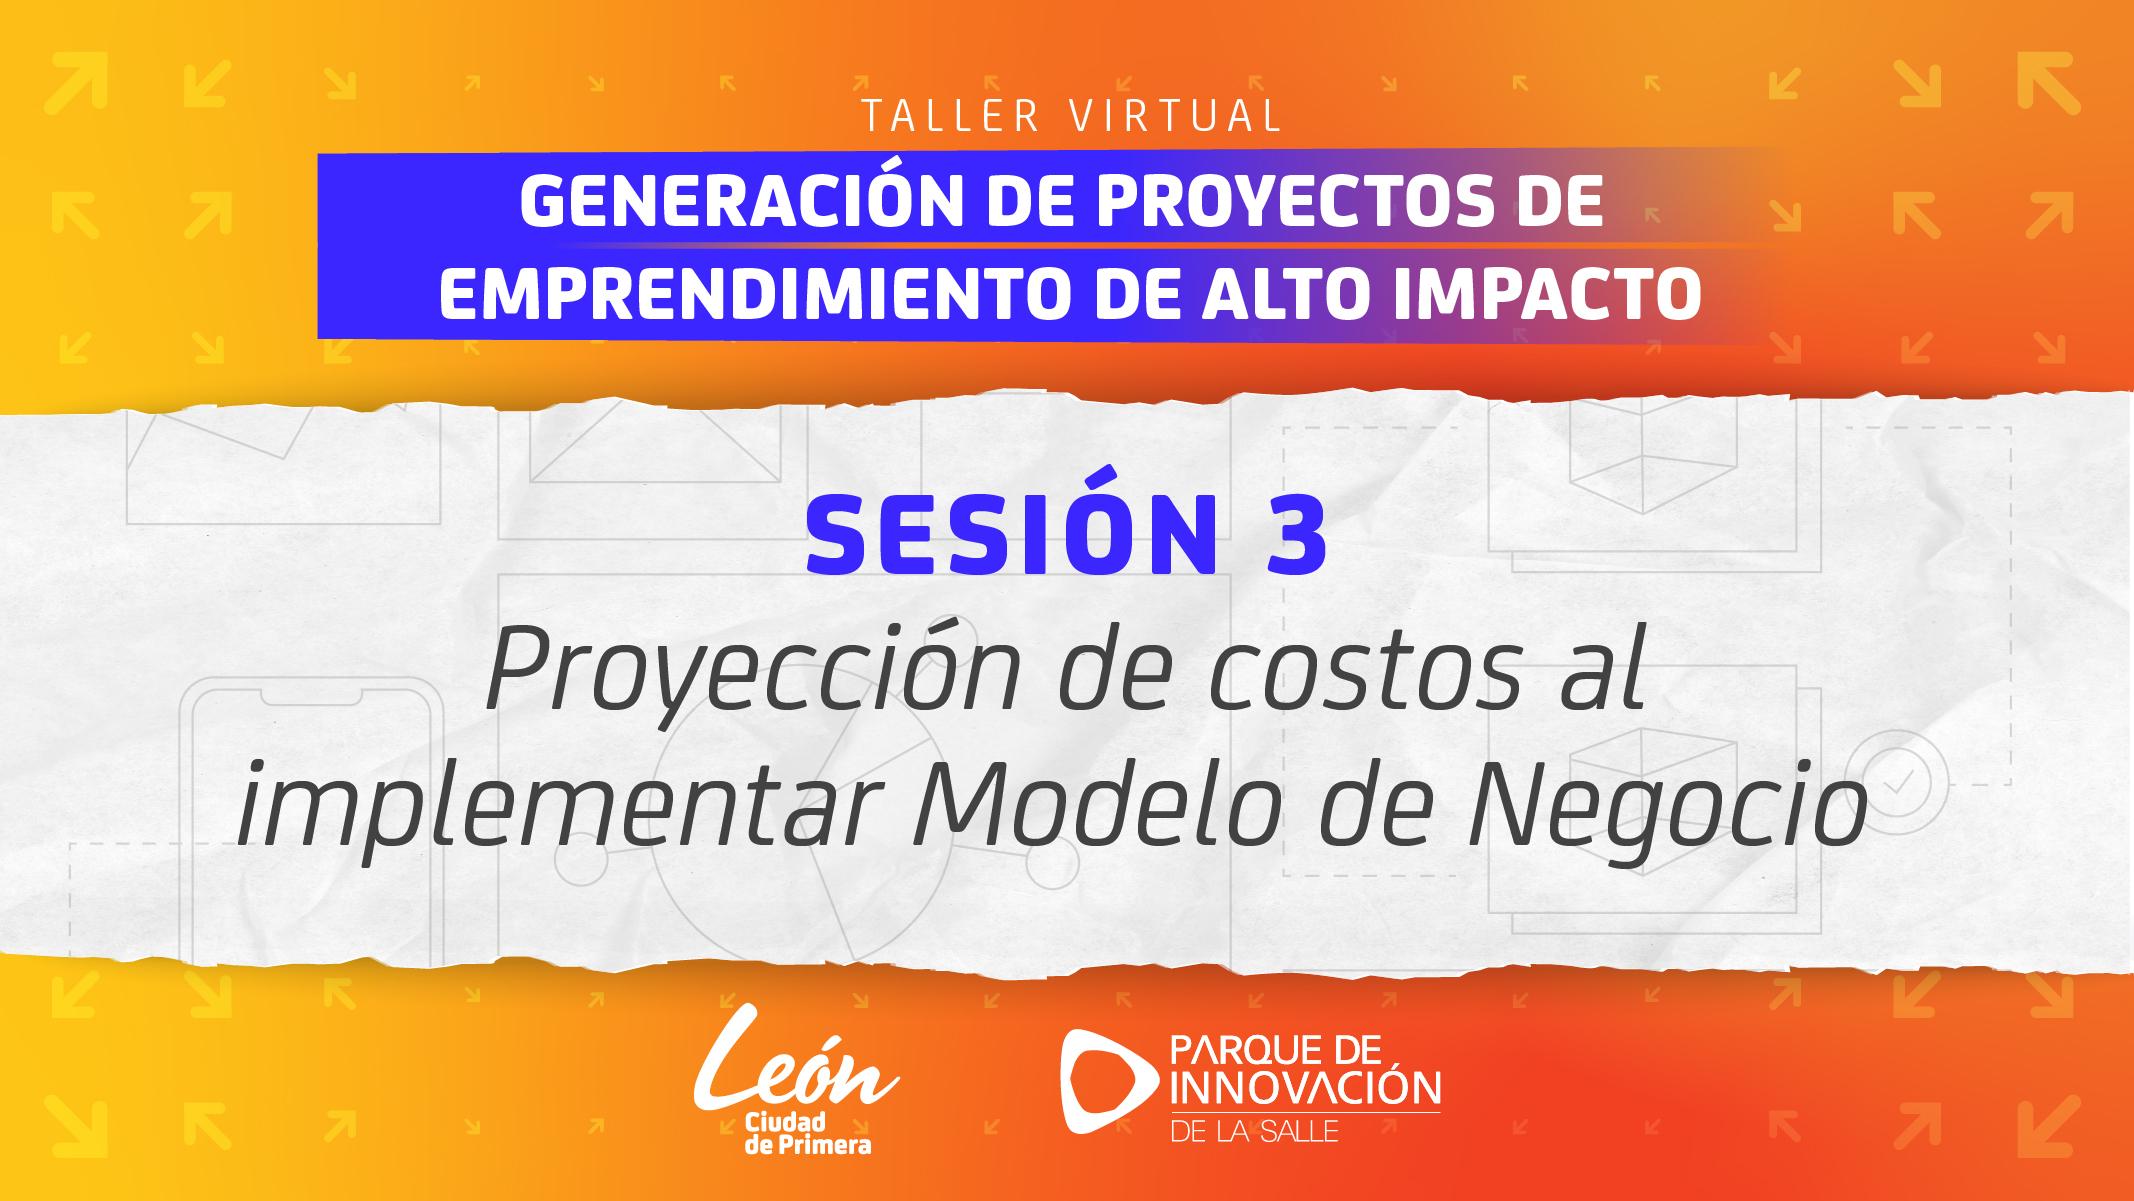 Sesión 3 – Taller de proyectos de emprendimiento de alto impacto